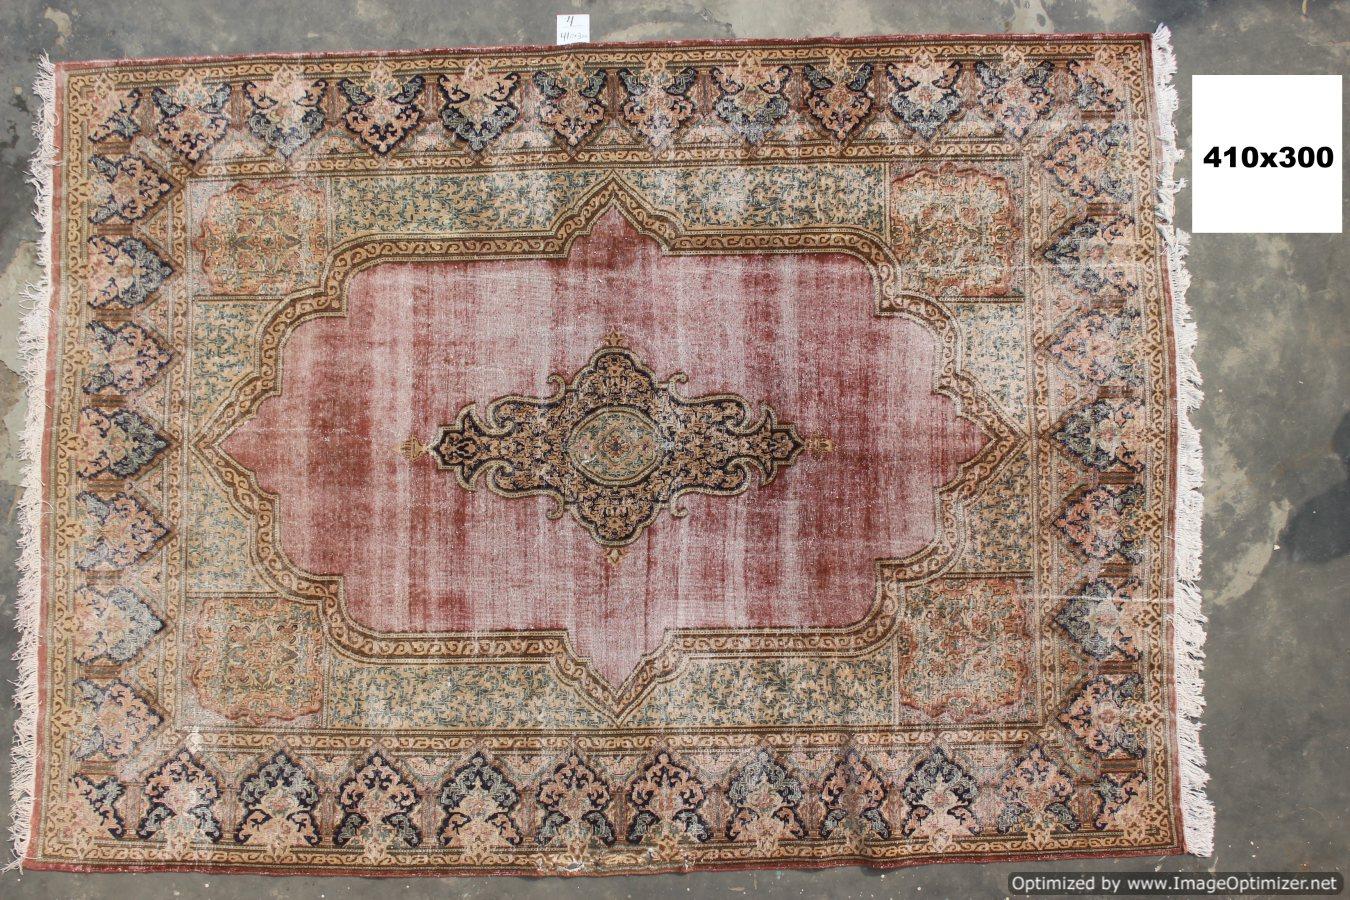 Vintage recoloured perzisch tapijt 04B (410cm x 300cm)